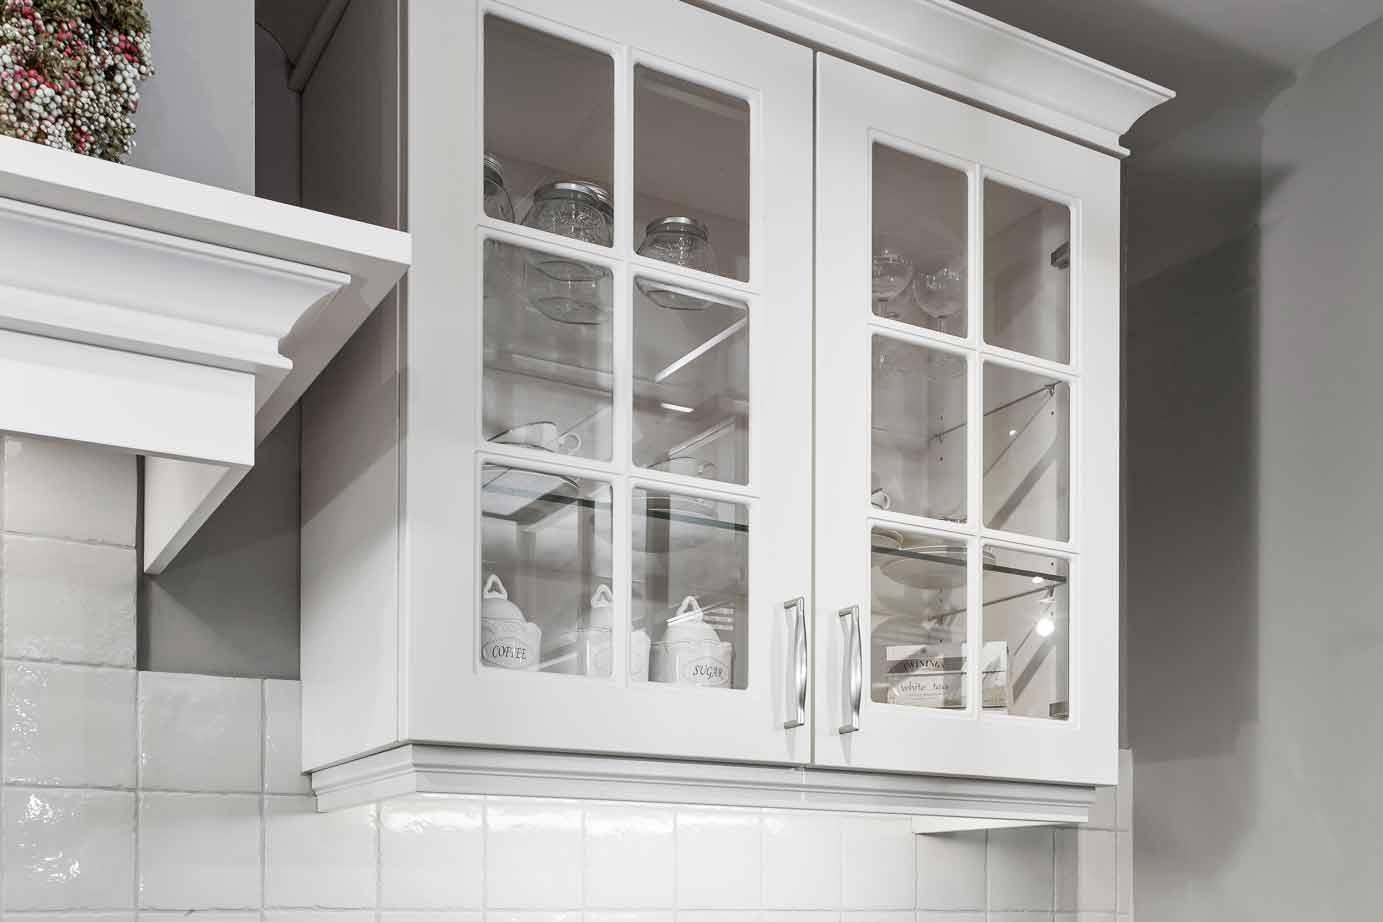 Handgrepen Keuken Prijs : Klassieke keuken DB Keukens